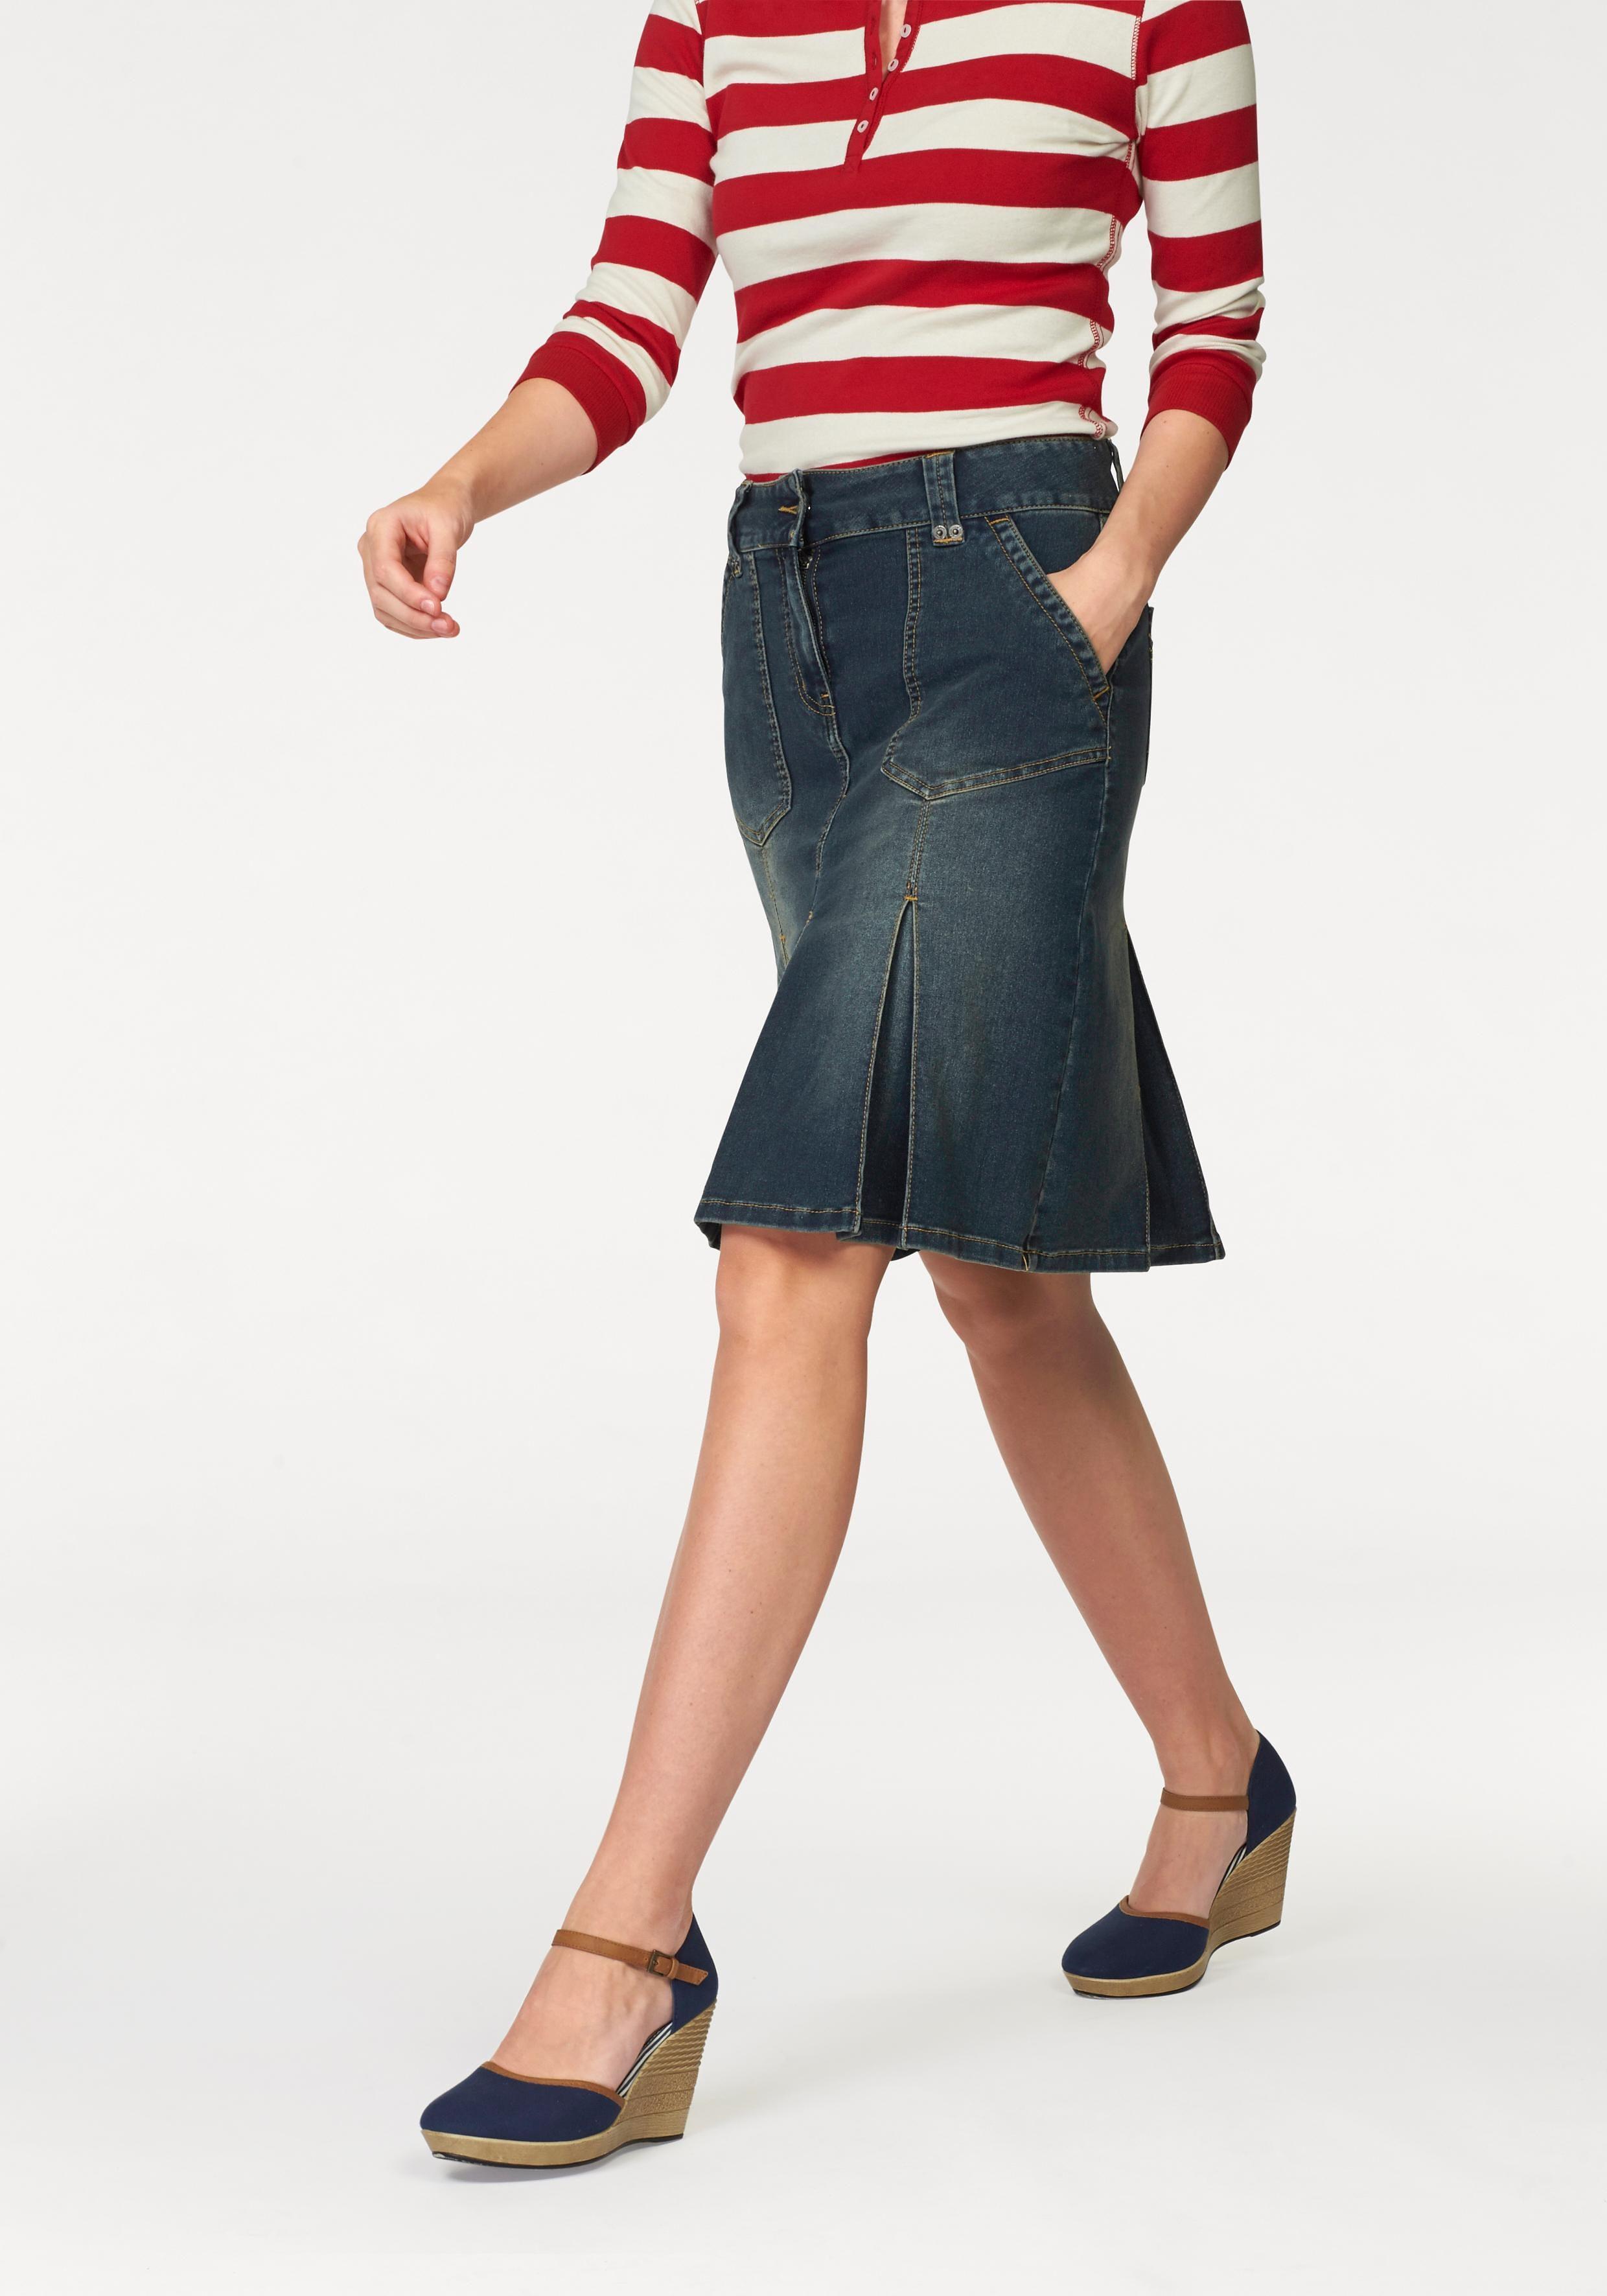 Aniston CASUAL Jeansrock, mit eingelegten Falten blau Damen Midiröcke Röcke Jeansrock